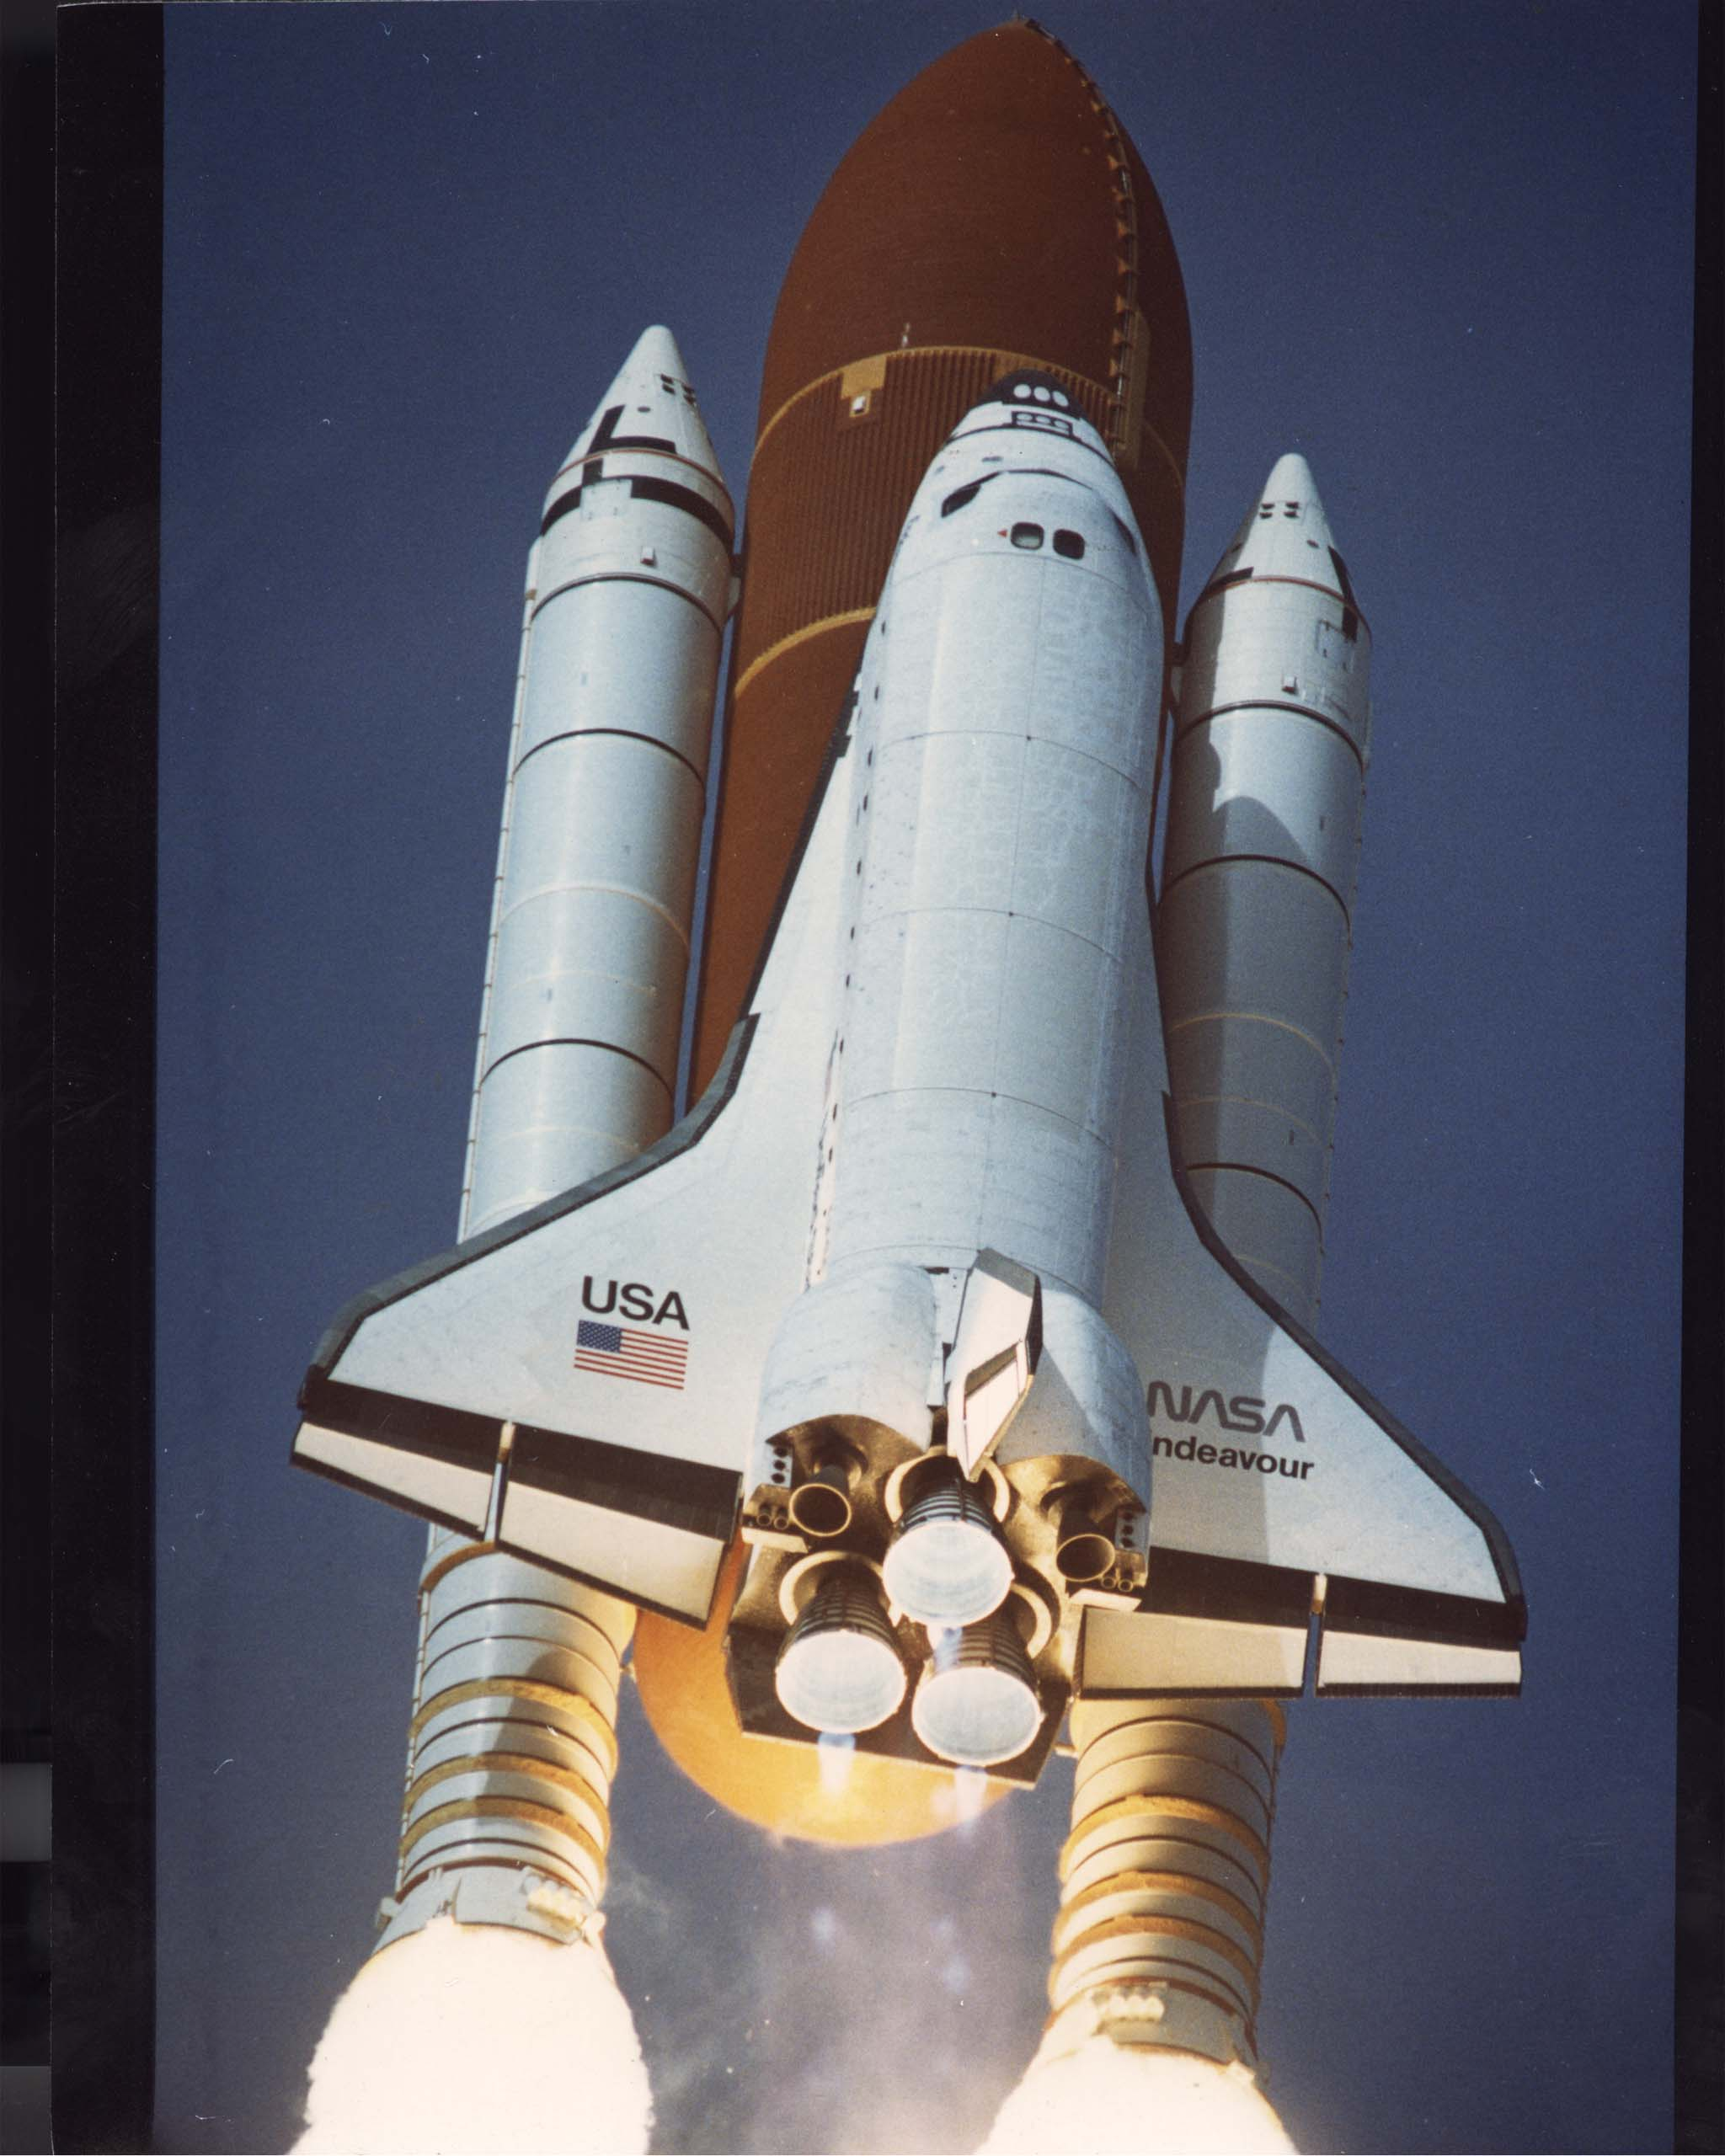 space shuttle endeavour nasa - photo #18